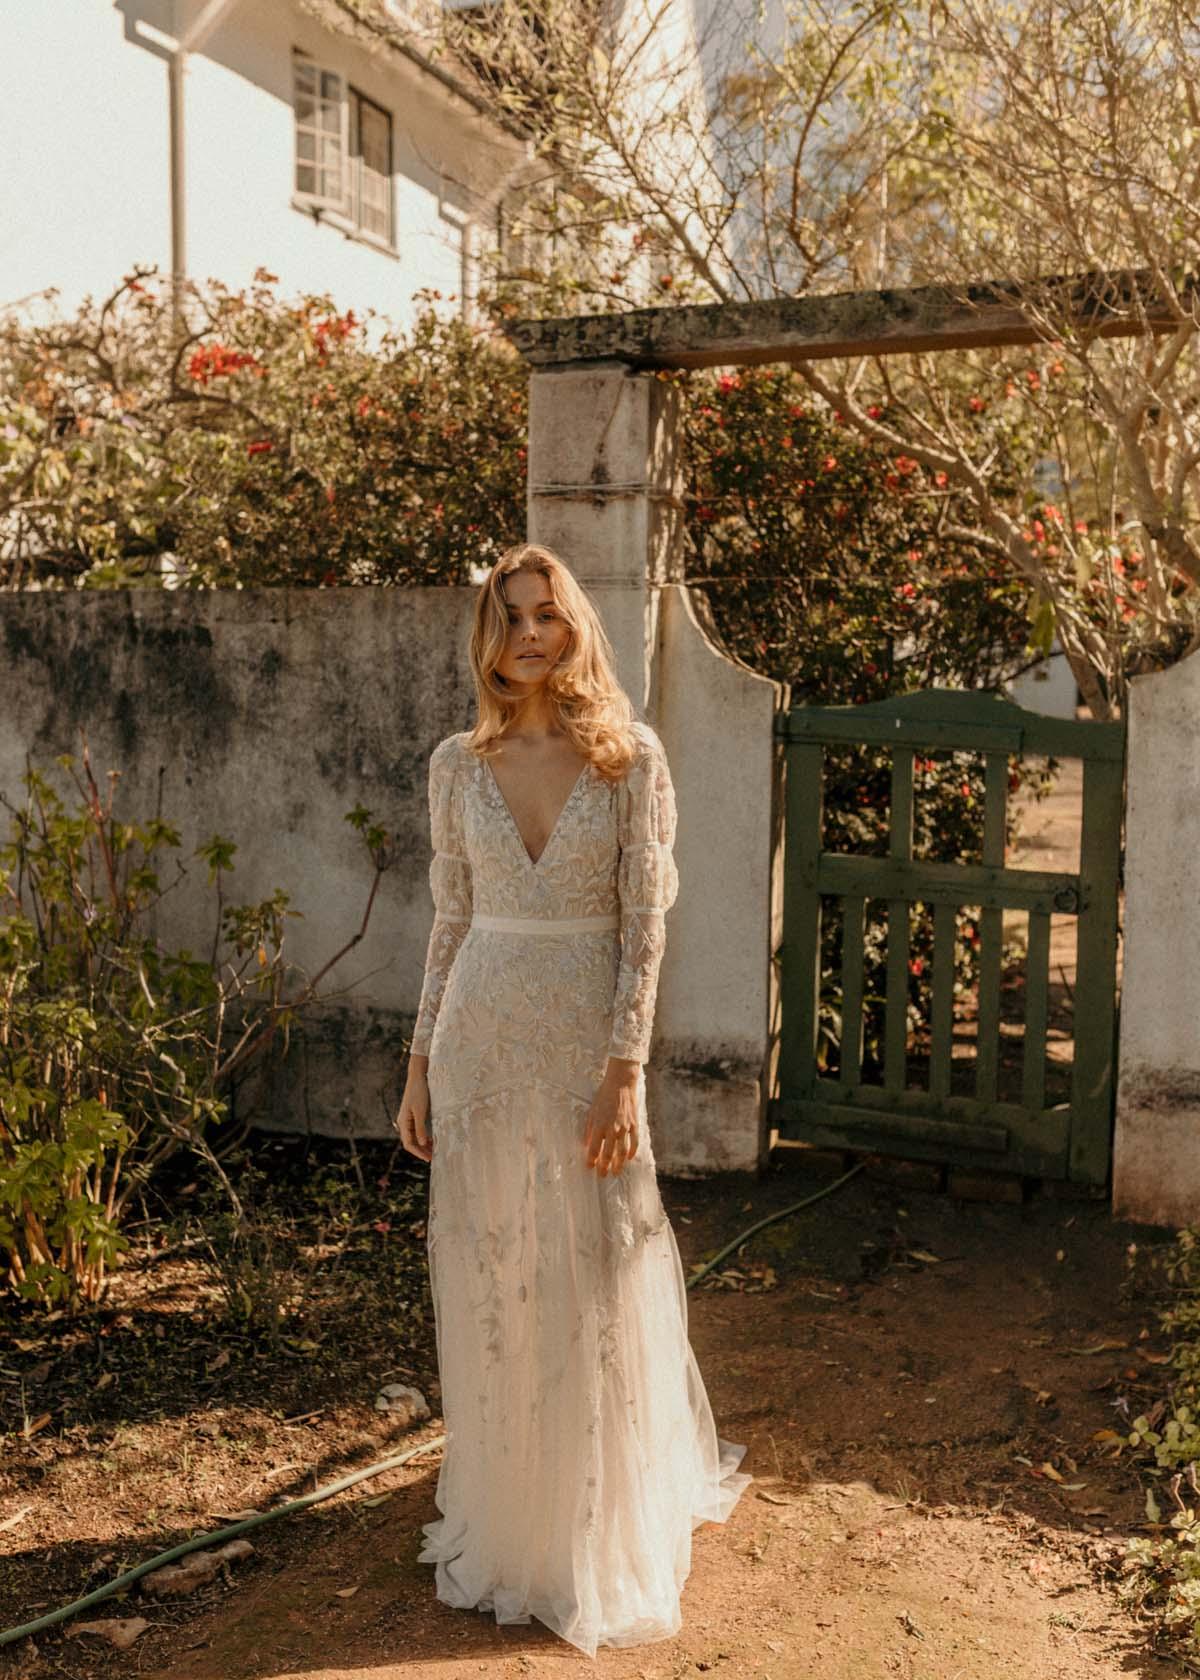 Wedding Dress Of Princess Elizabeth Wikipedia